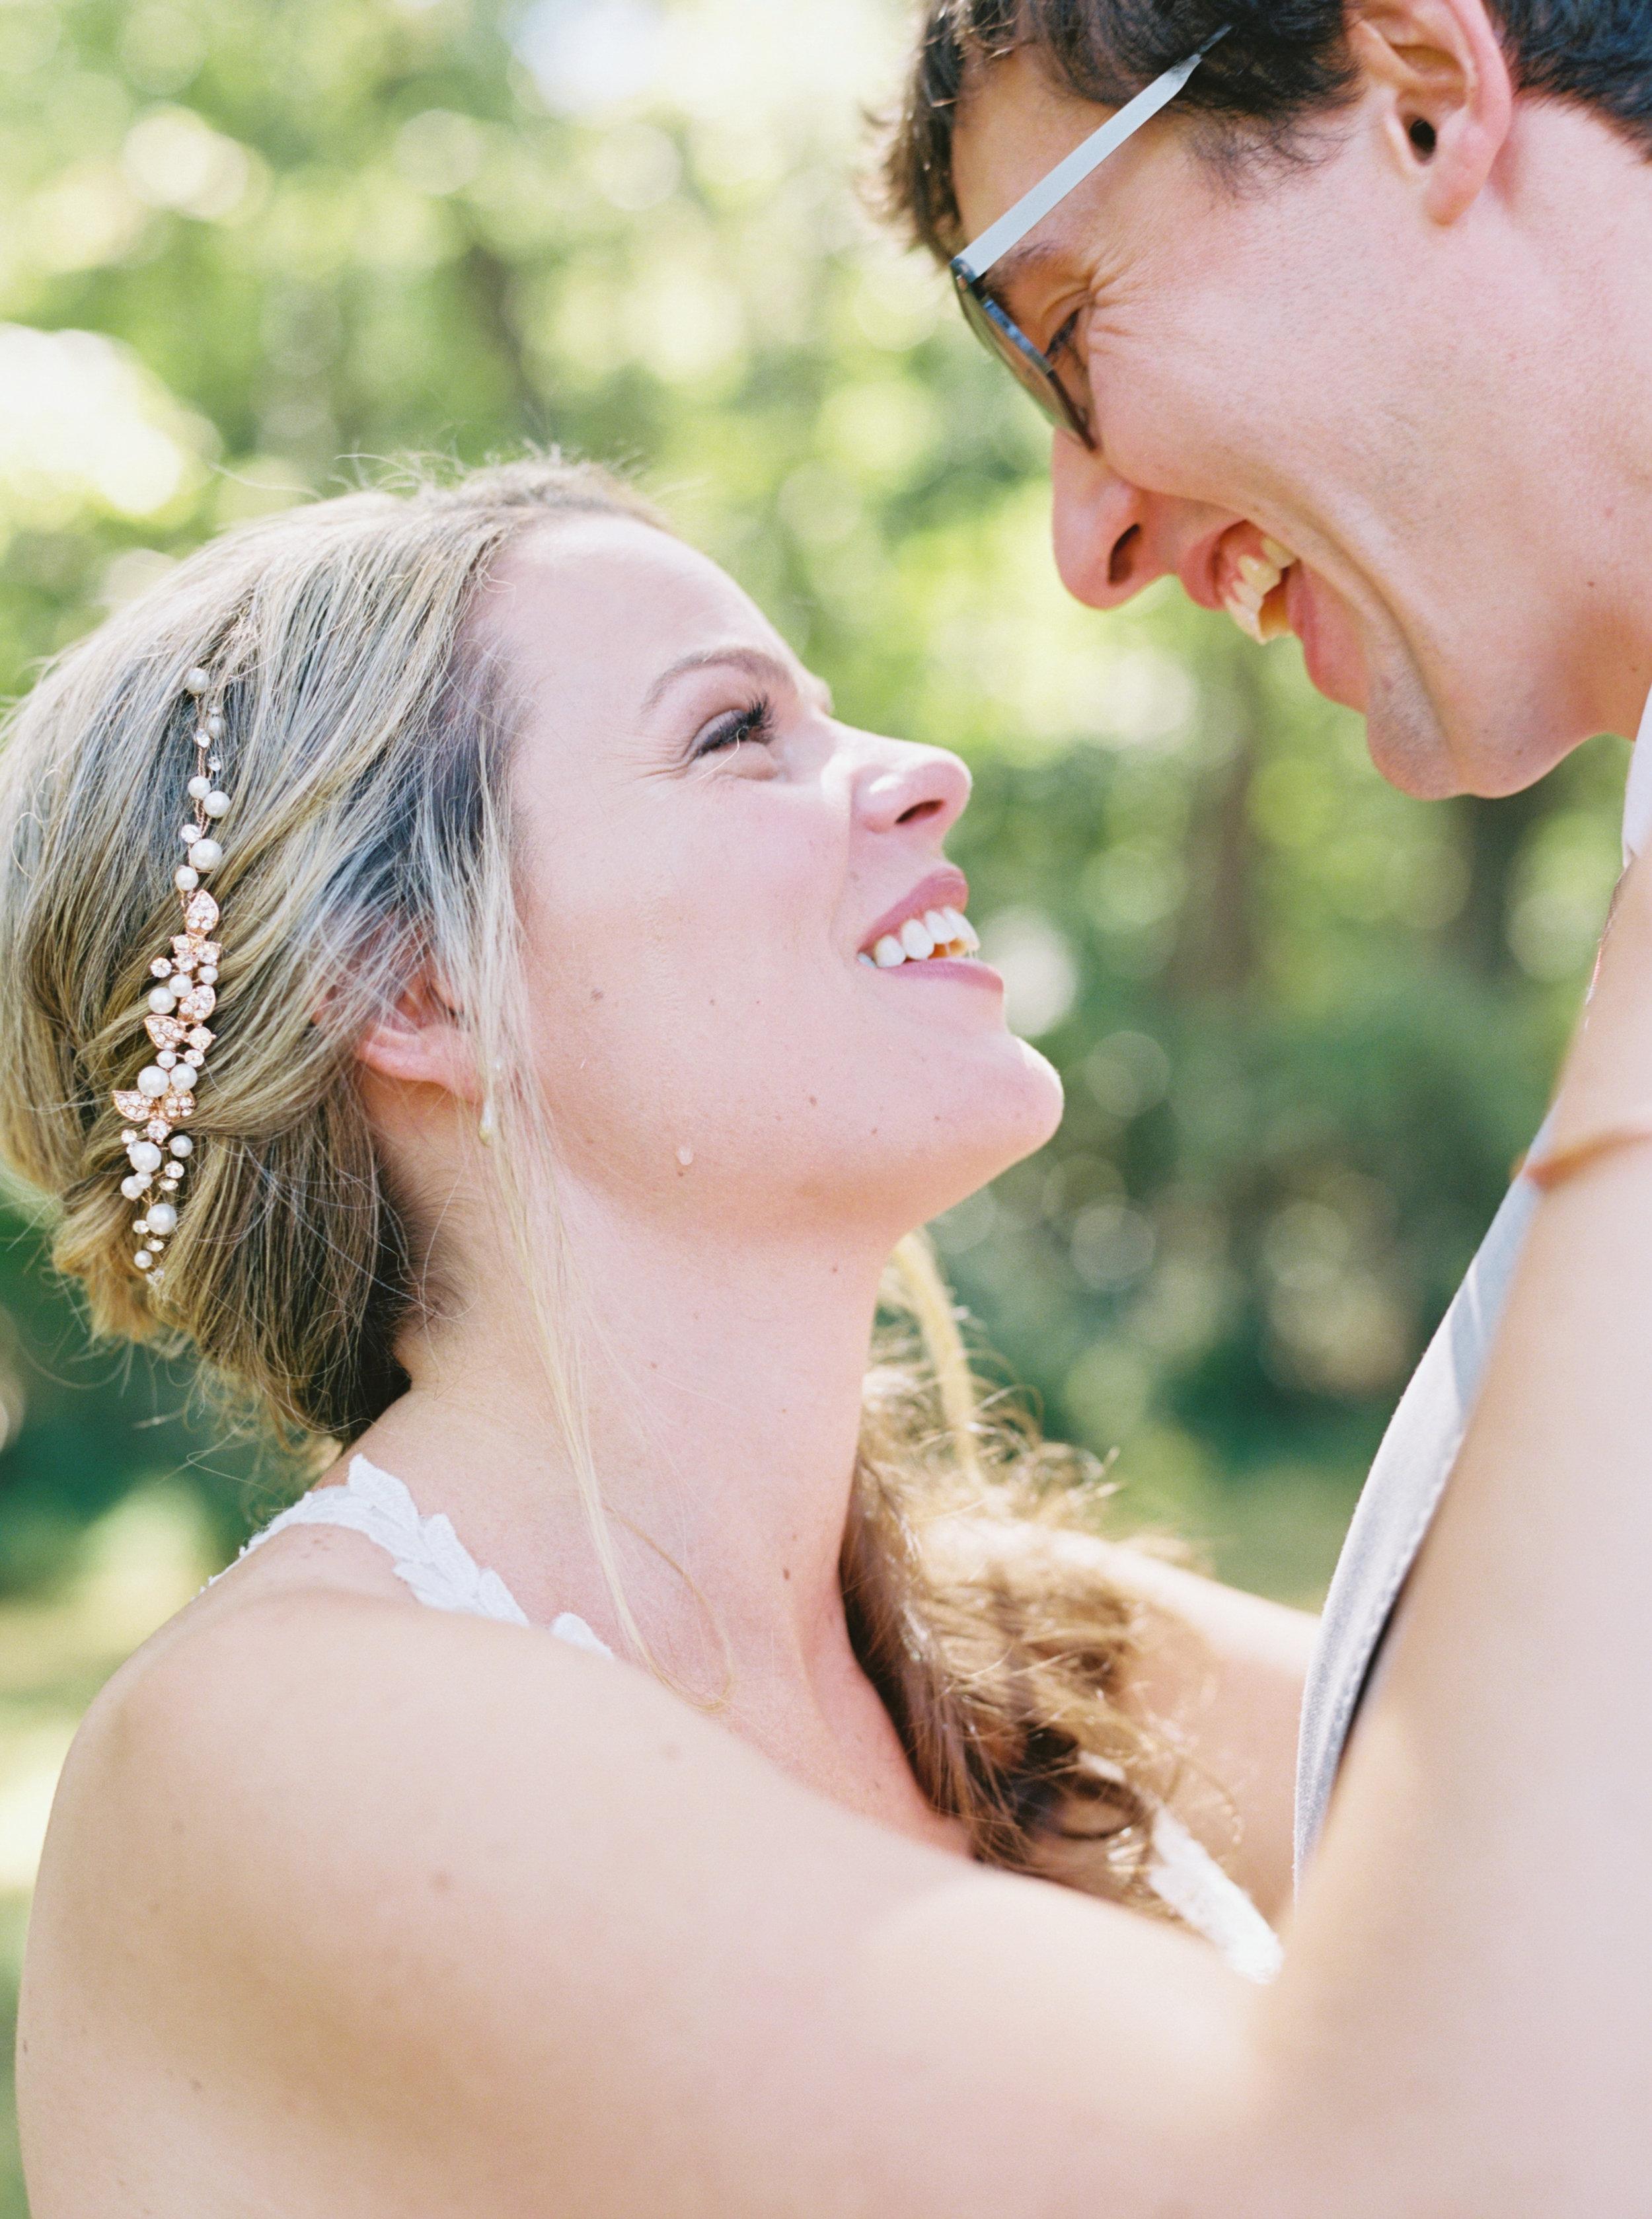 Abby_Simon_Wedding_Abigail_Malone_Photography_nashville_Bloomsbury_Farm-92.jpg